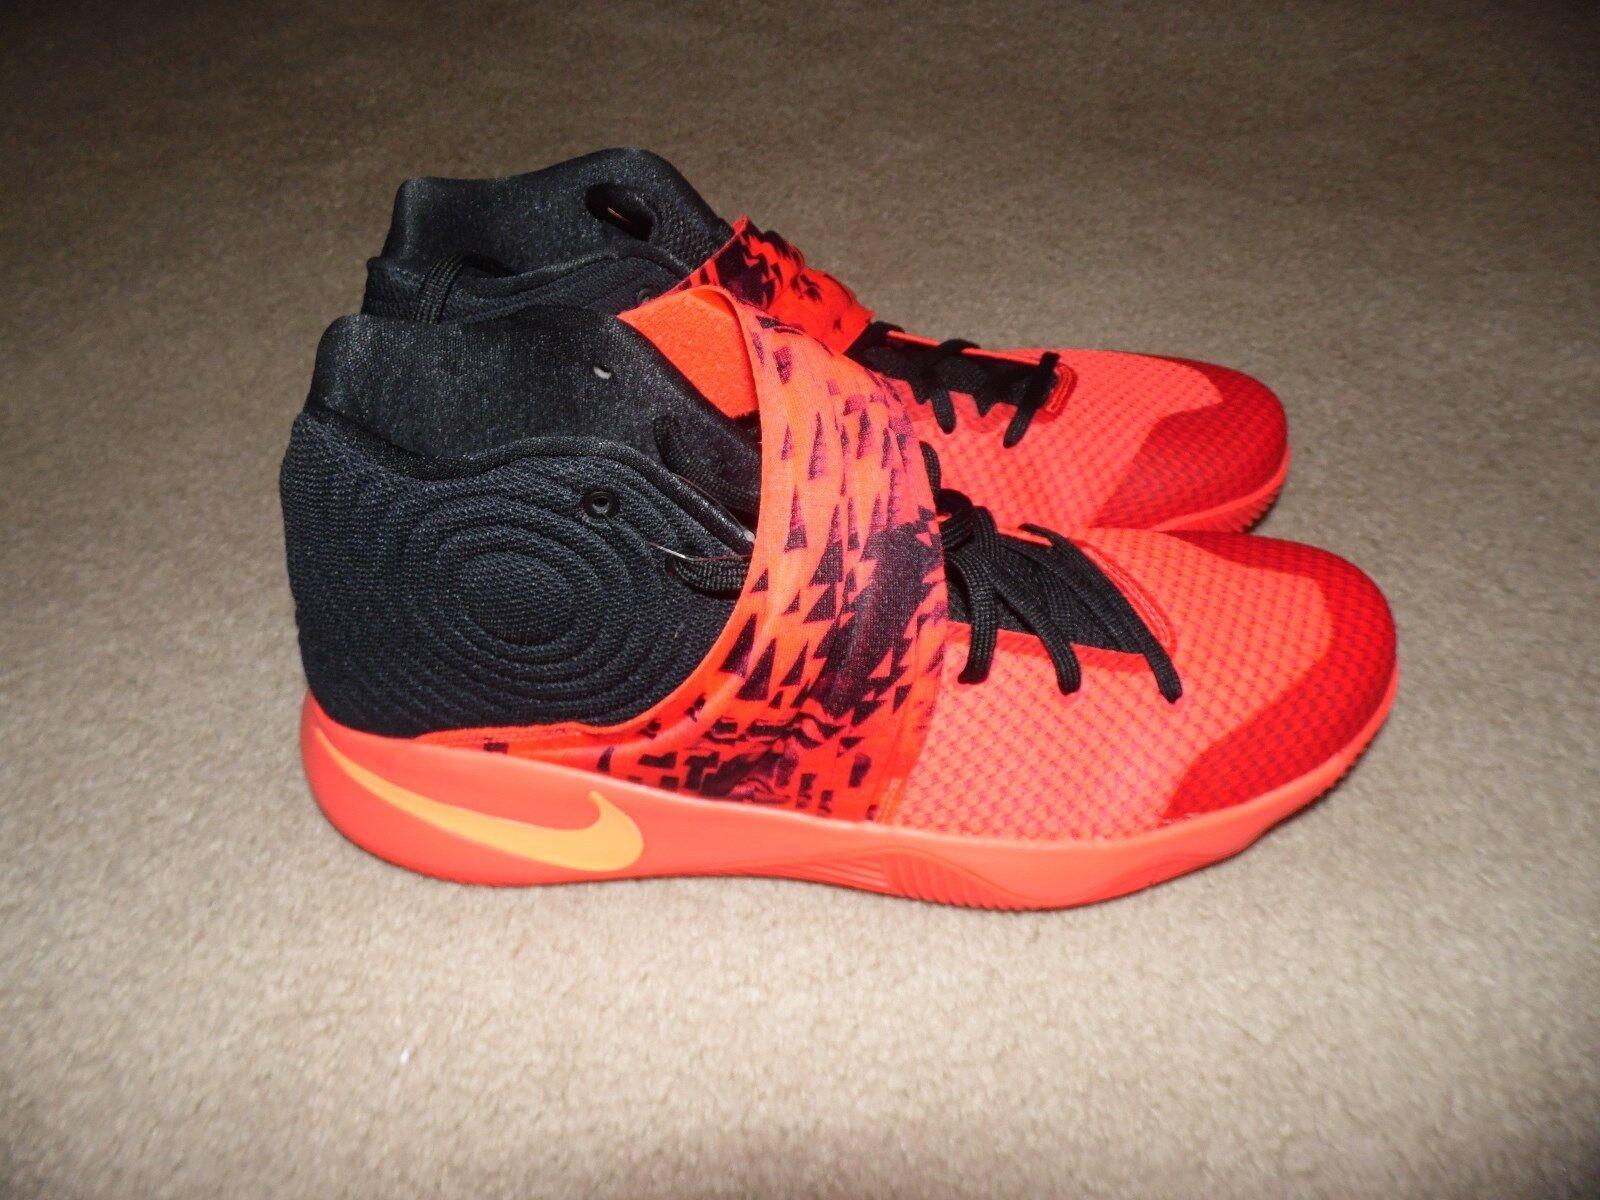 New Men's Sz 18 Nike Kyrie 2 Irving Inferno Crimson orange Black 819583-680 RARE